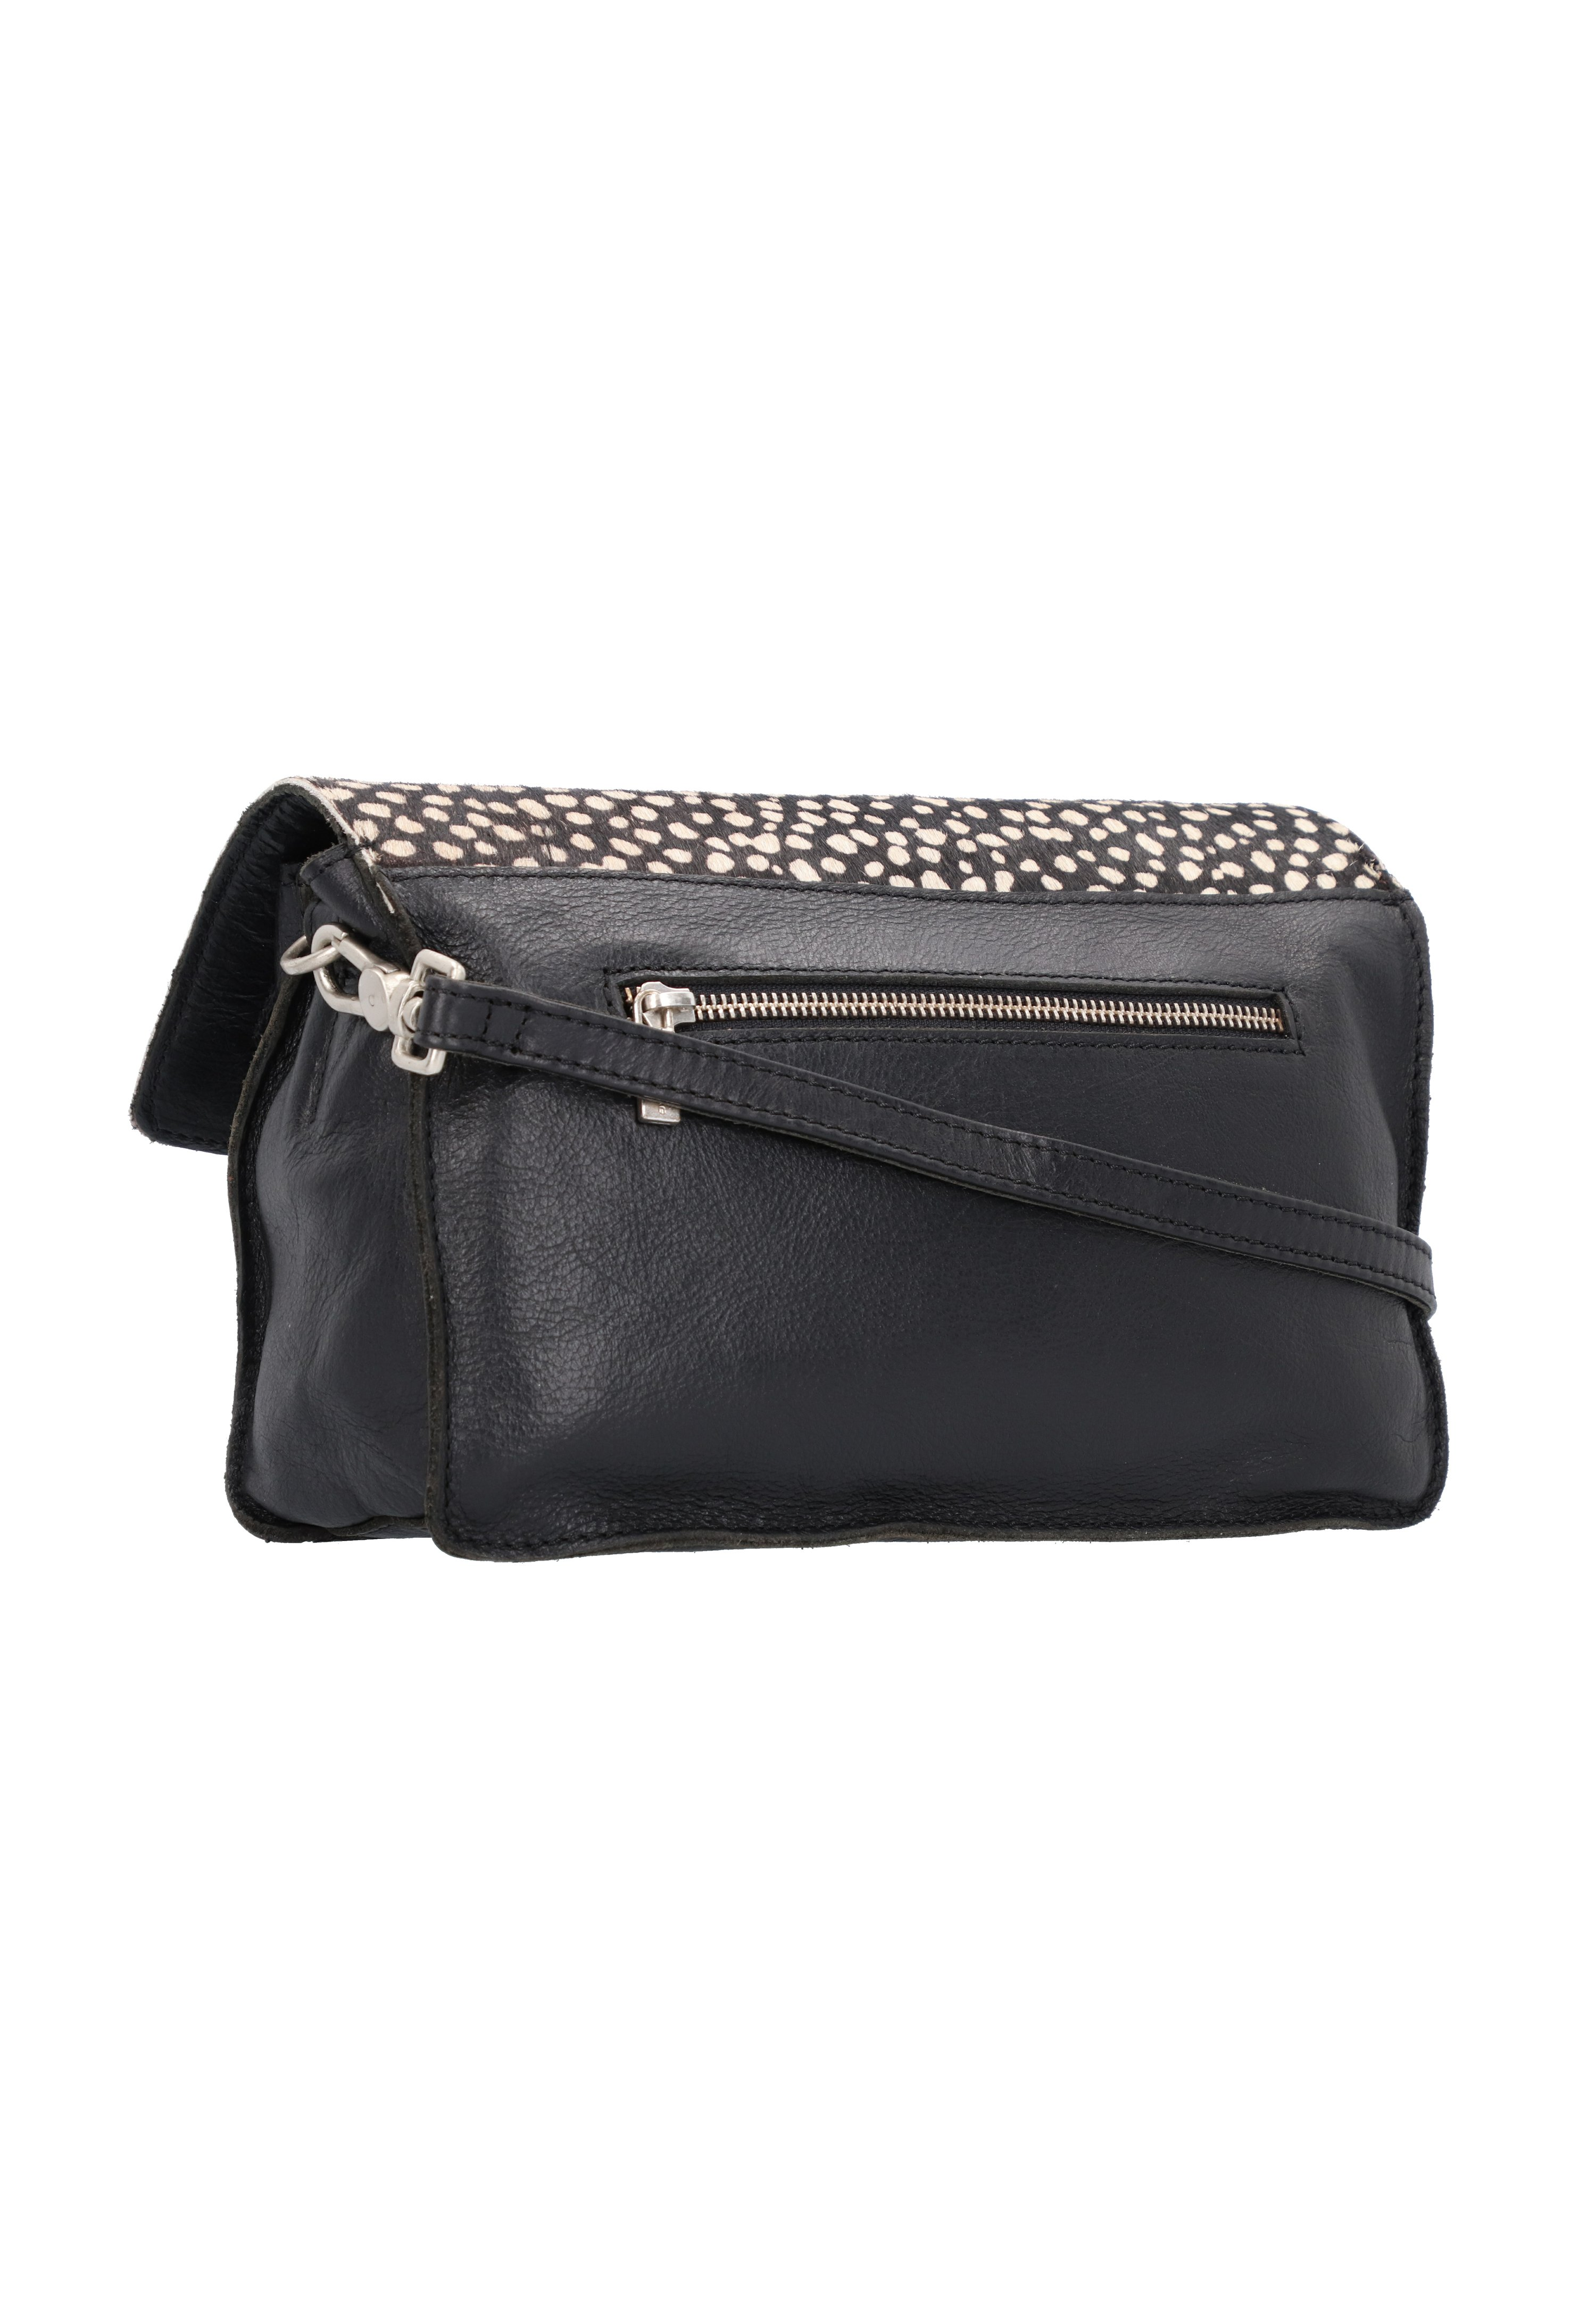 Cowboysbag Sac Bandoulière - Black/off-white